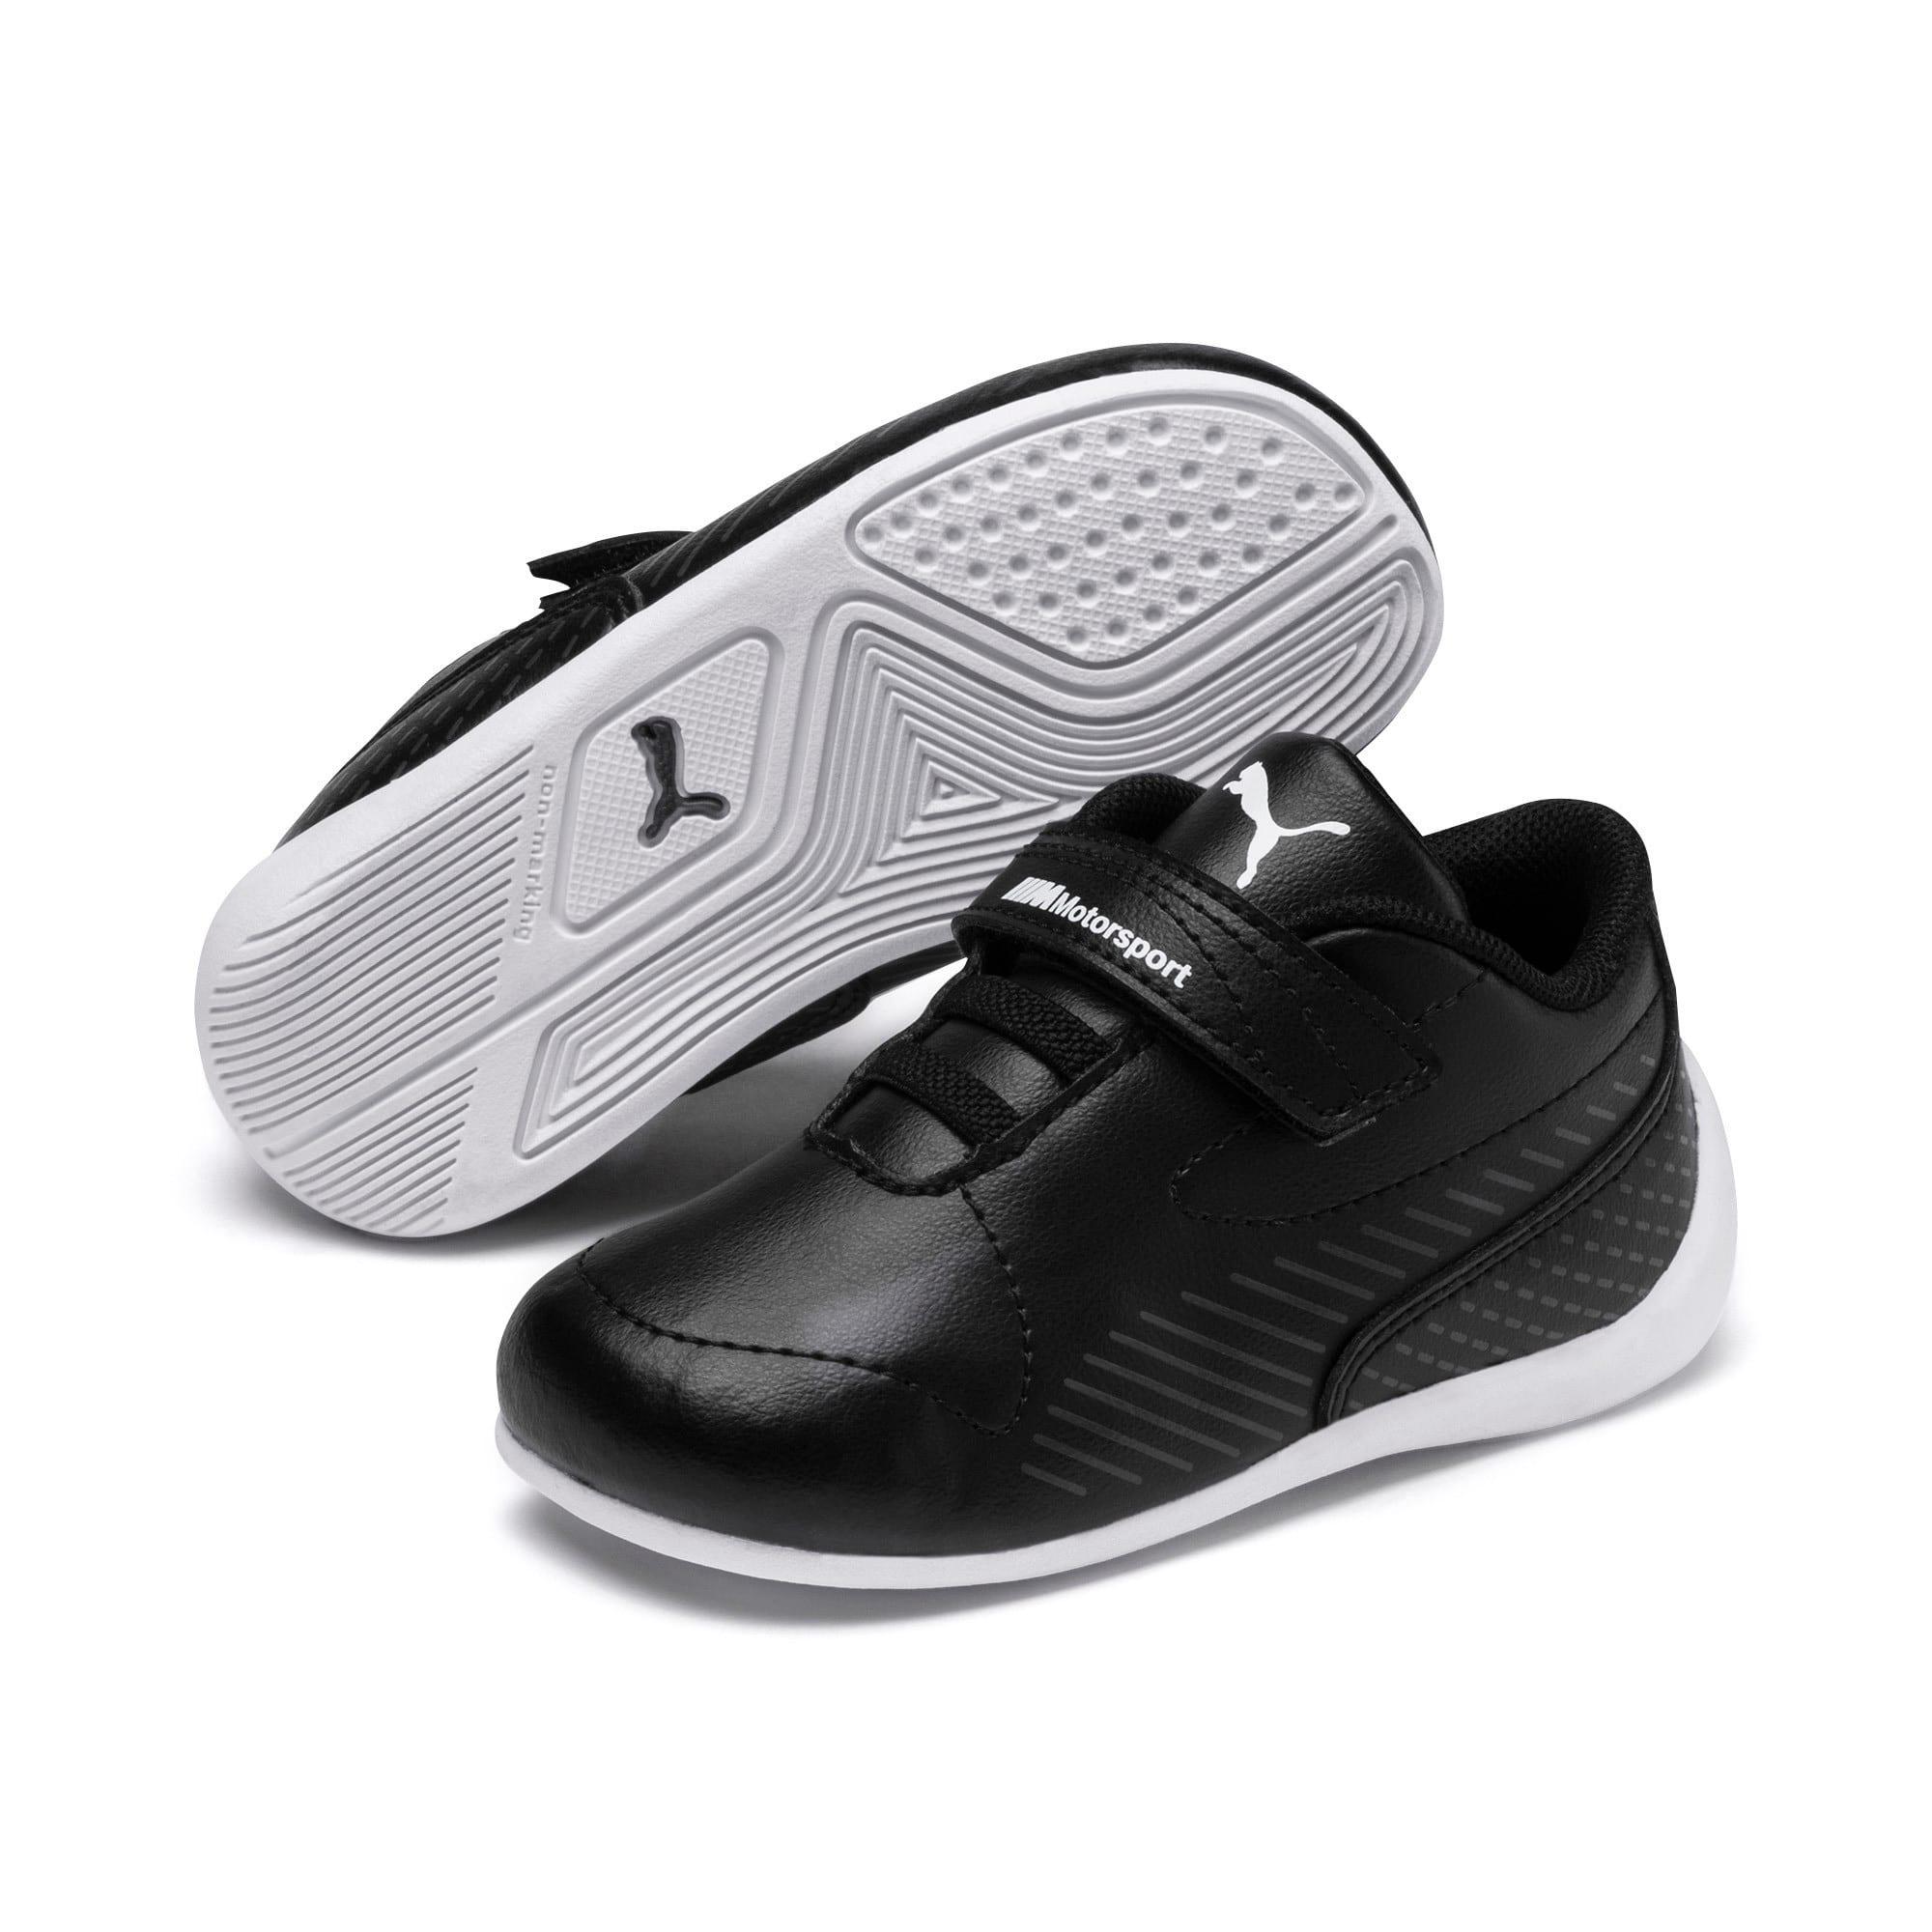 Thumbnail 2 of BMW MMS Drift Cat 7S Toddler Shoes, Puma Black-Puma Black, medium